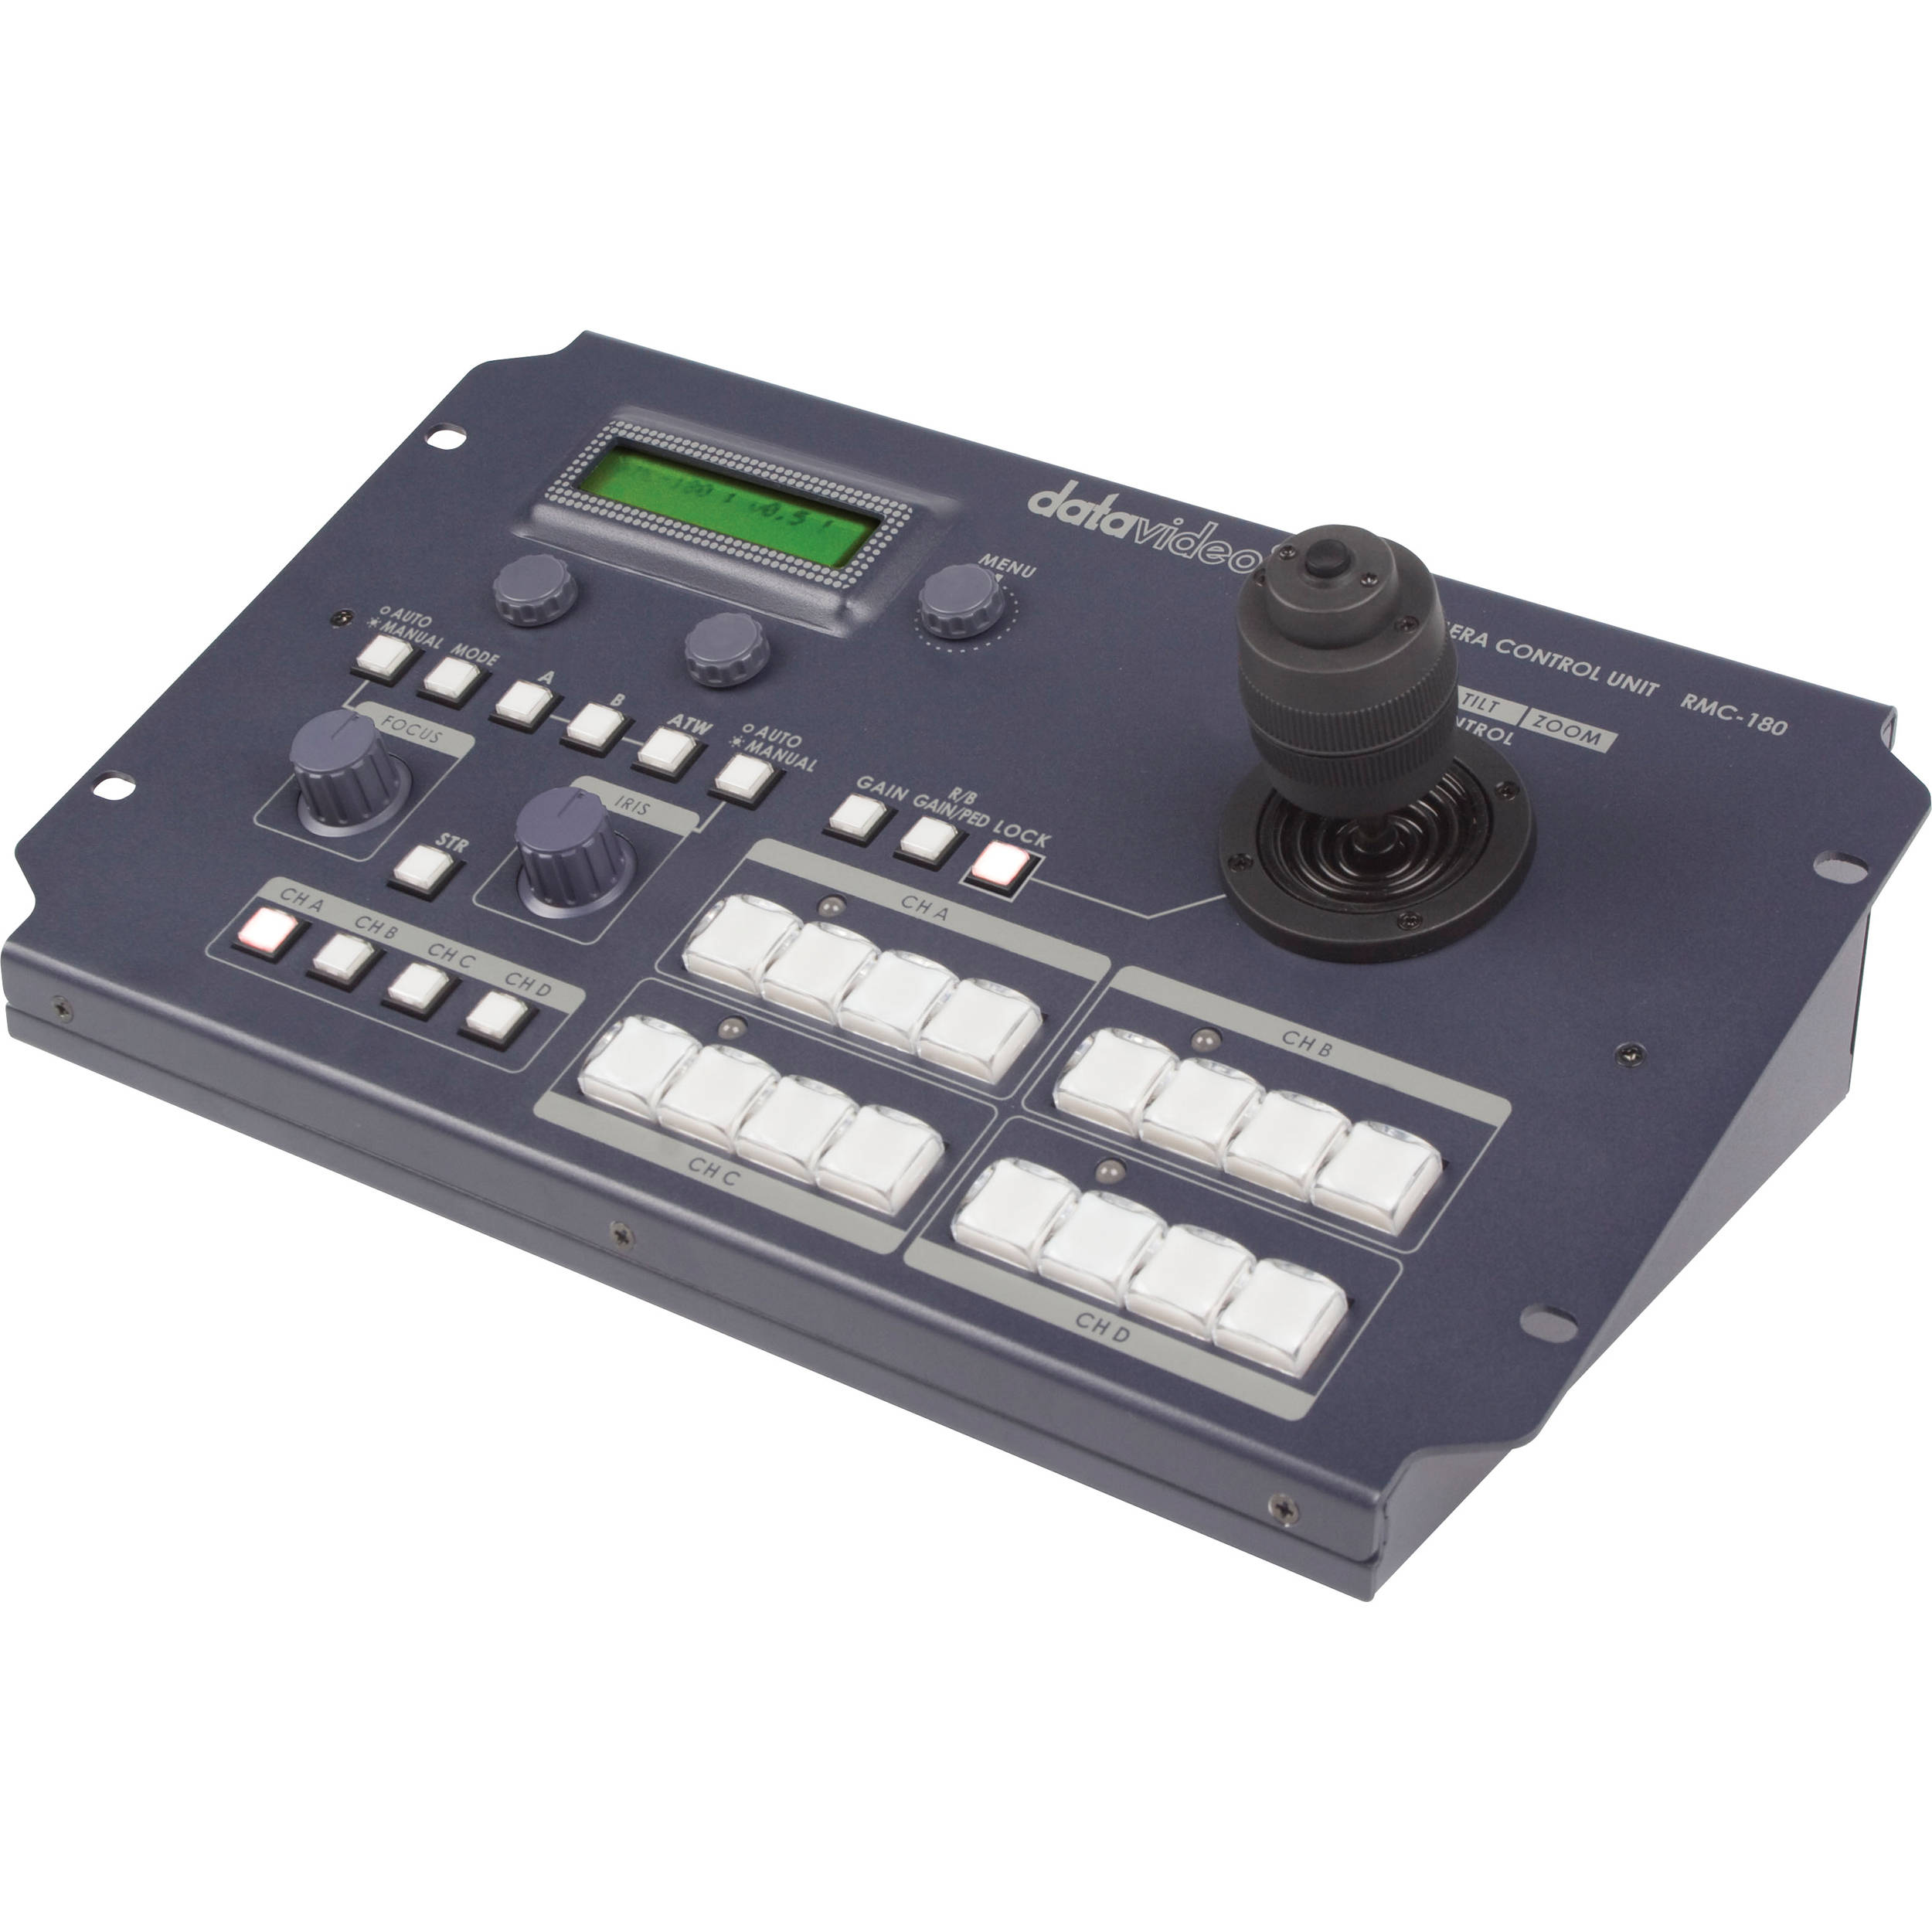 RMC-180 PTZ Camera remote controller